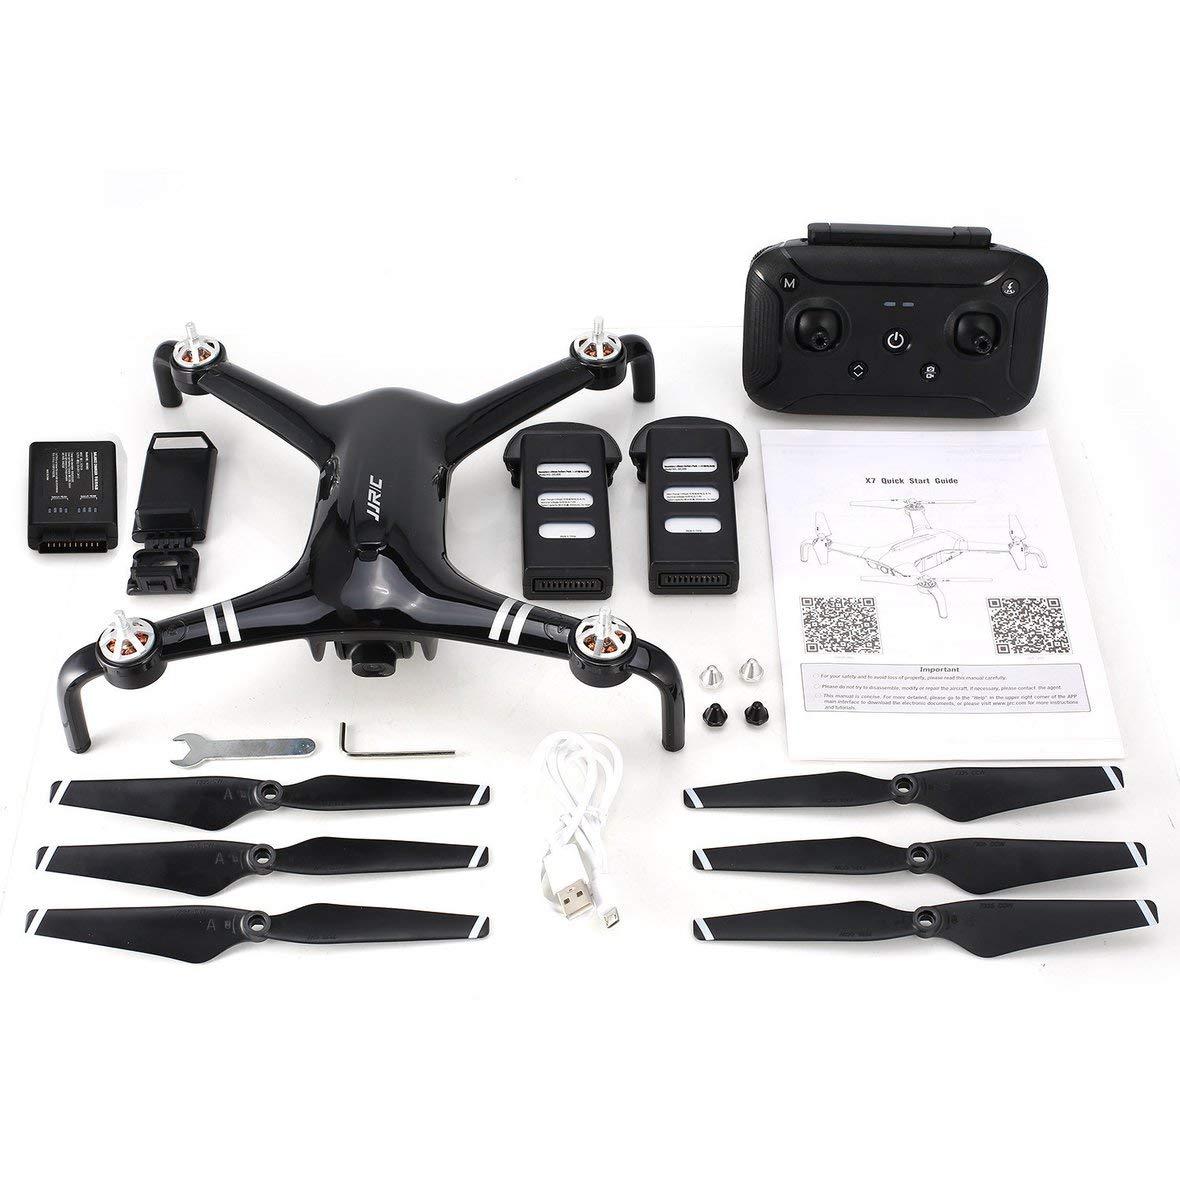 Heaviesk Für JJR   C X7 SMART RC Hubschrauber Brushless Motor RC Drohne mit 5G WiFi FPV 1080P HD Kamera GPS Quadcopter Doppelbatterien